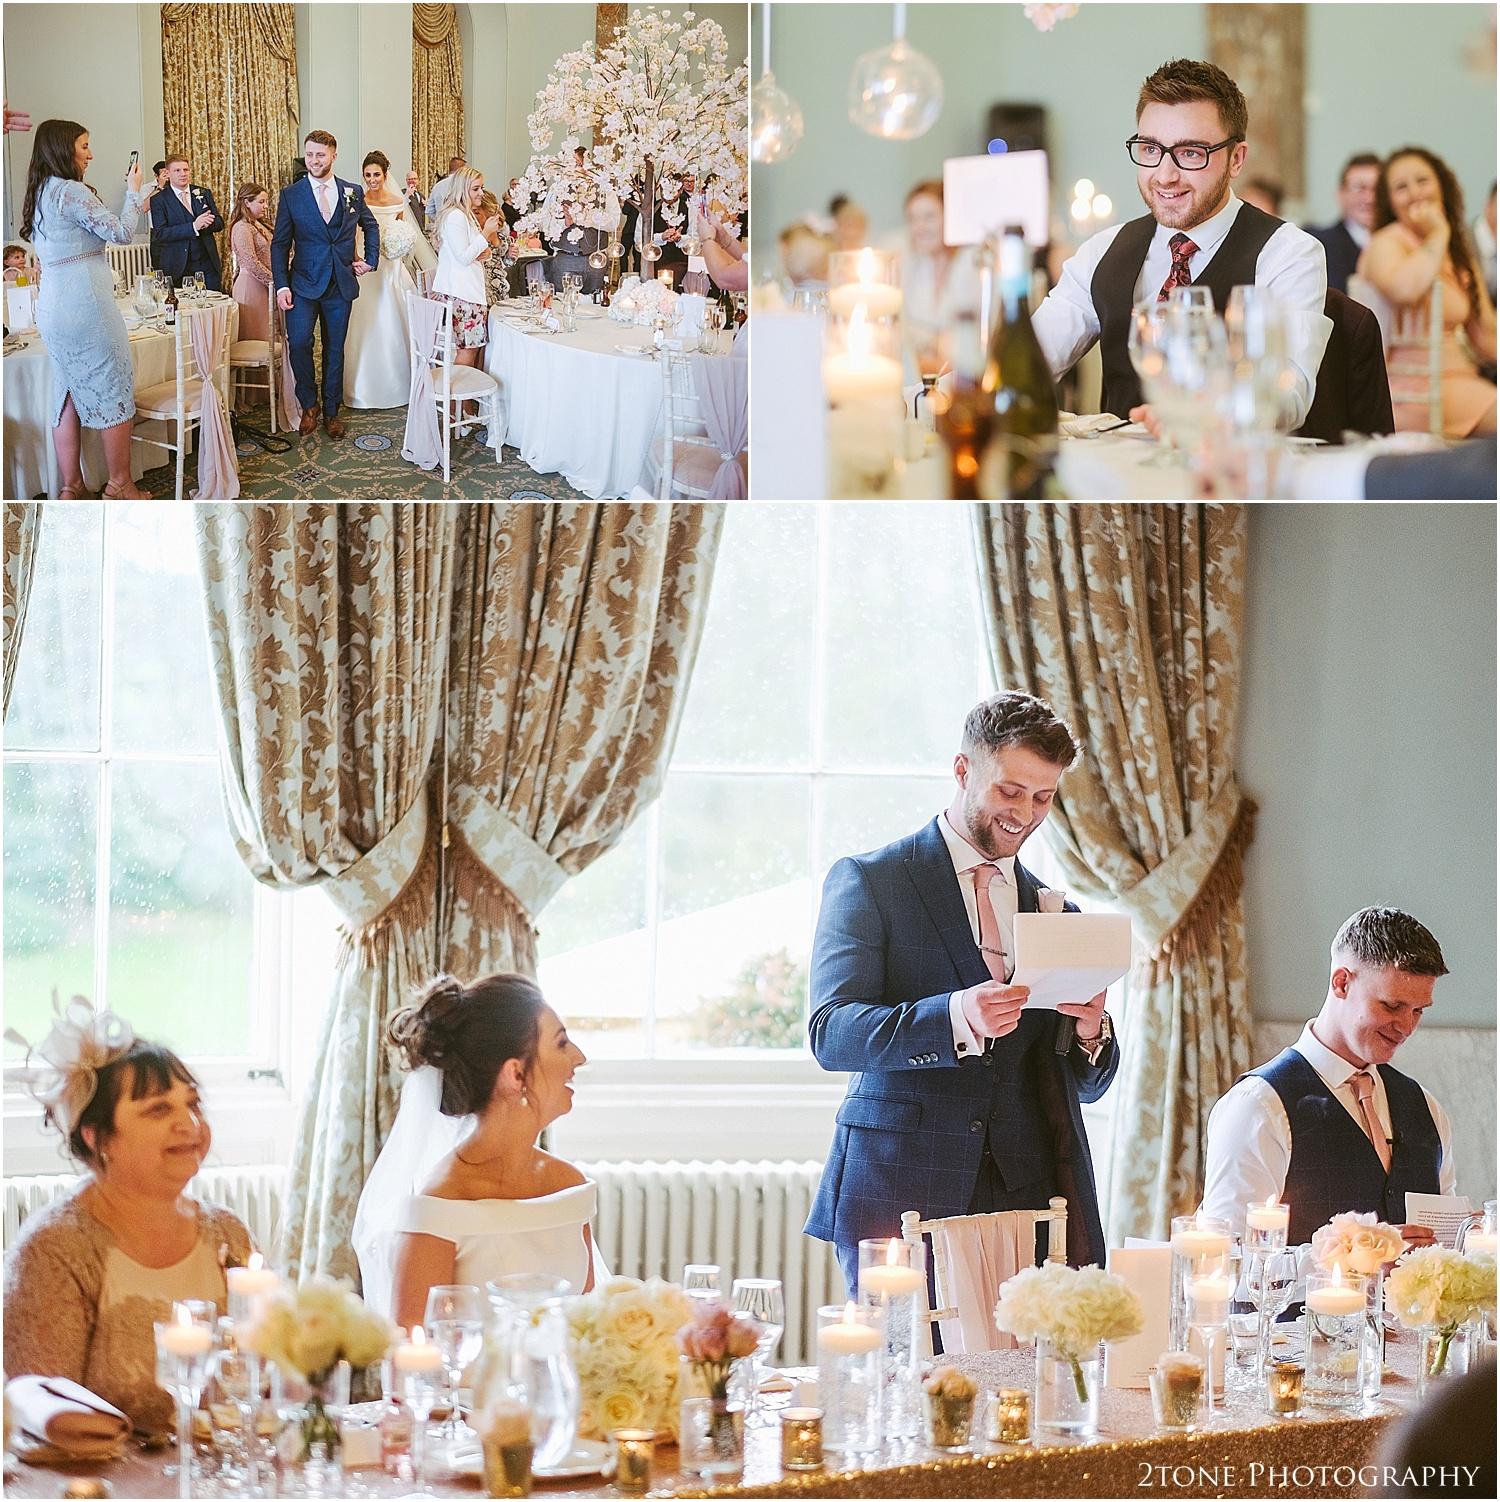 Wynyard Hall wedding photographer 066.jpg